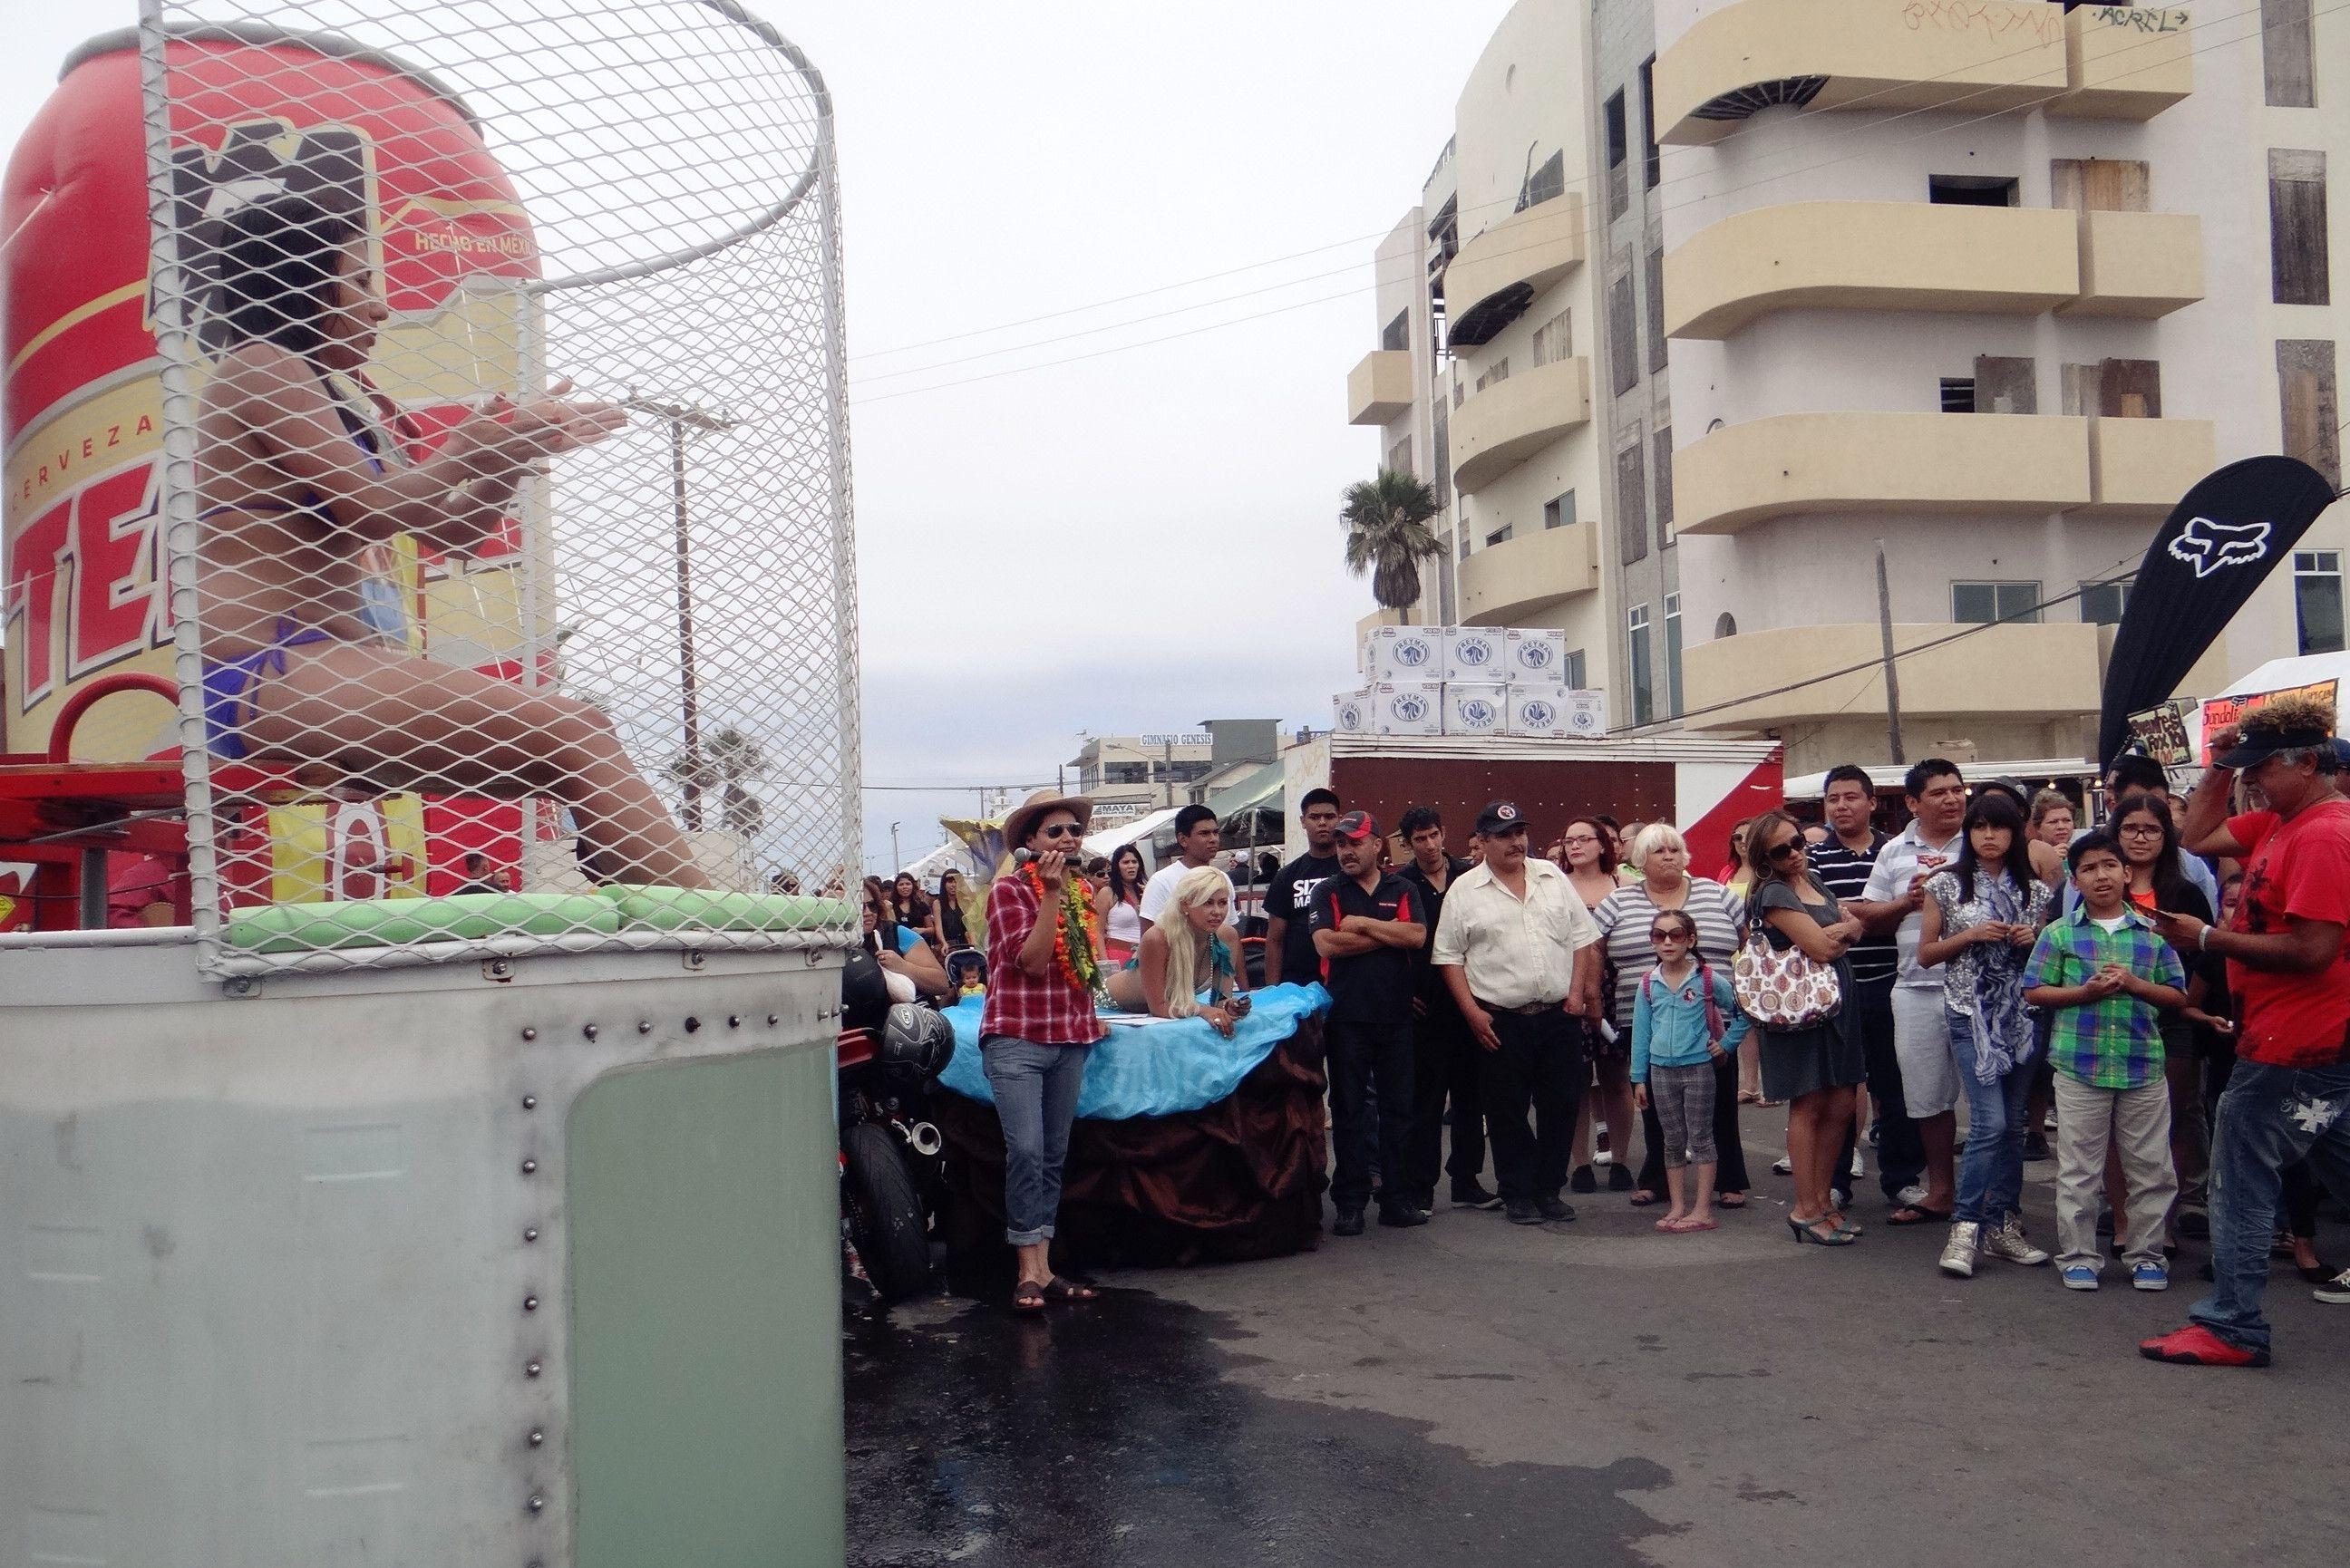 Dunk Tank en El 5to Festival de Tijuana en La Playa